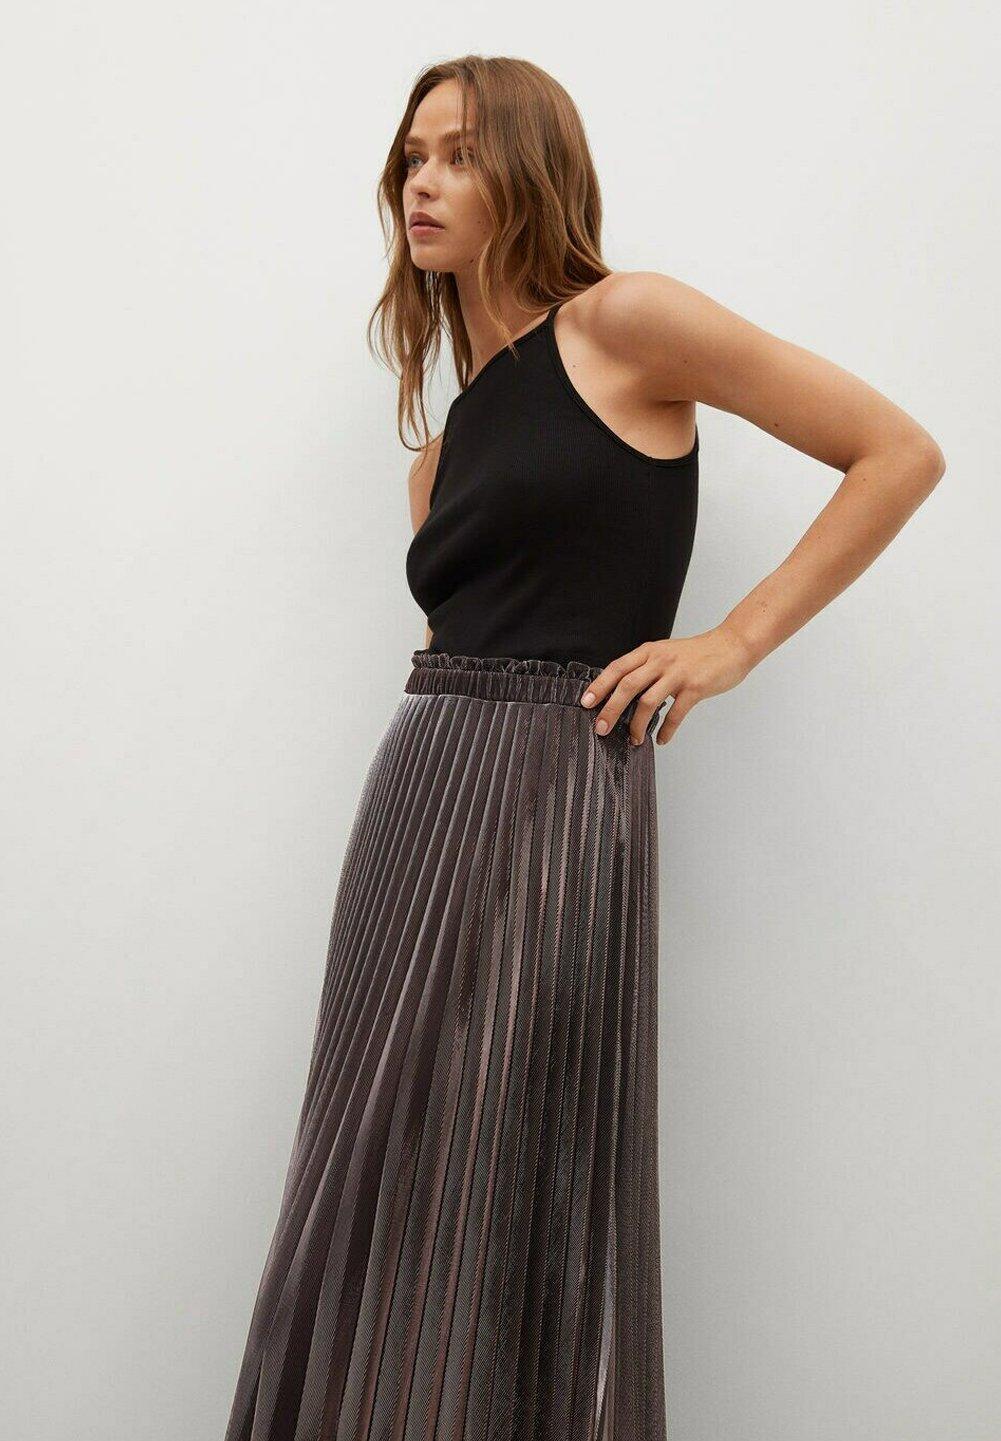 Femme MOSQUETA-A - Jupe plissée